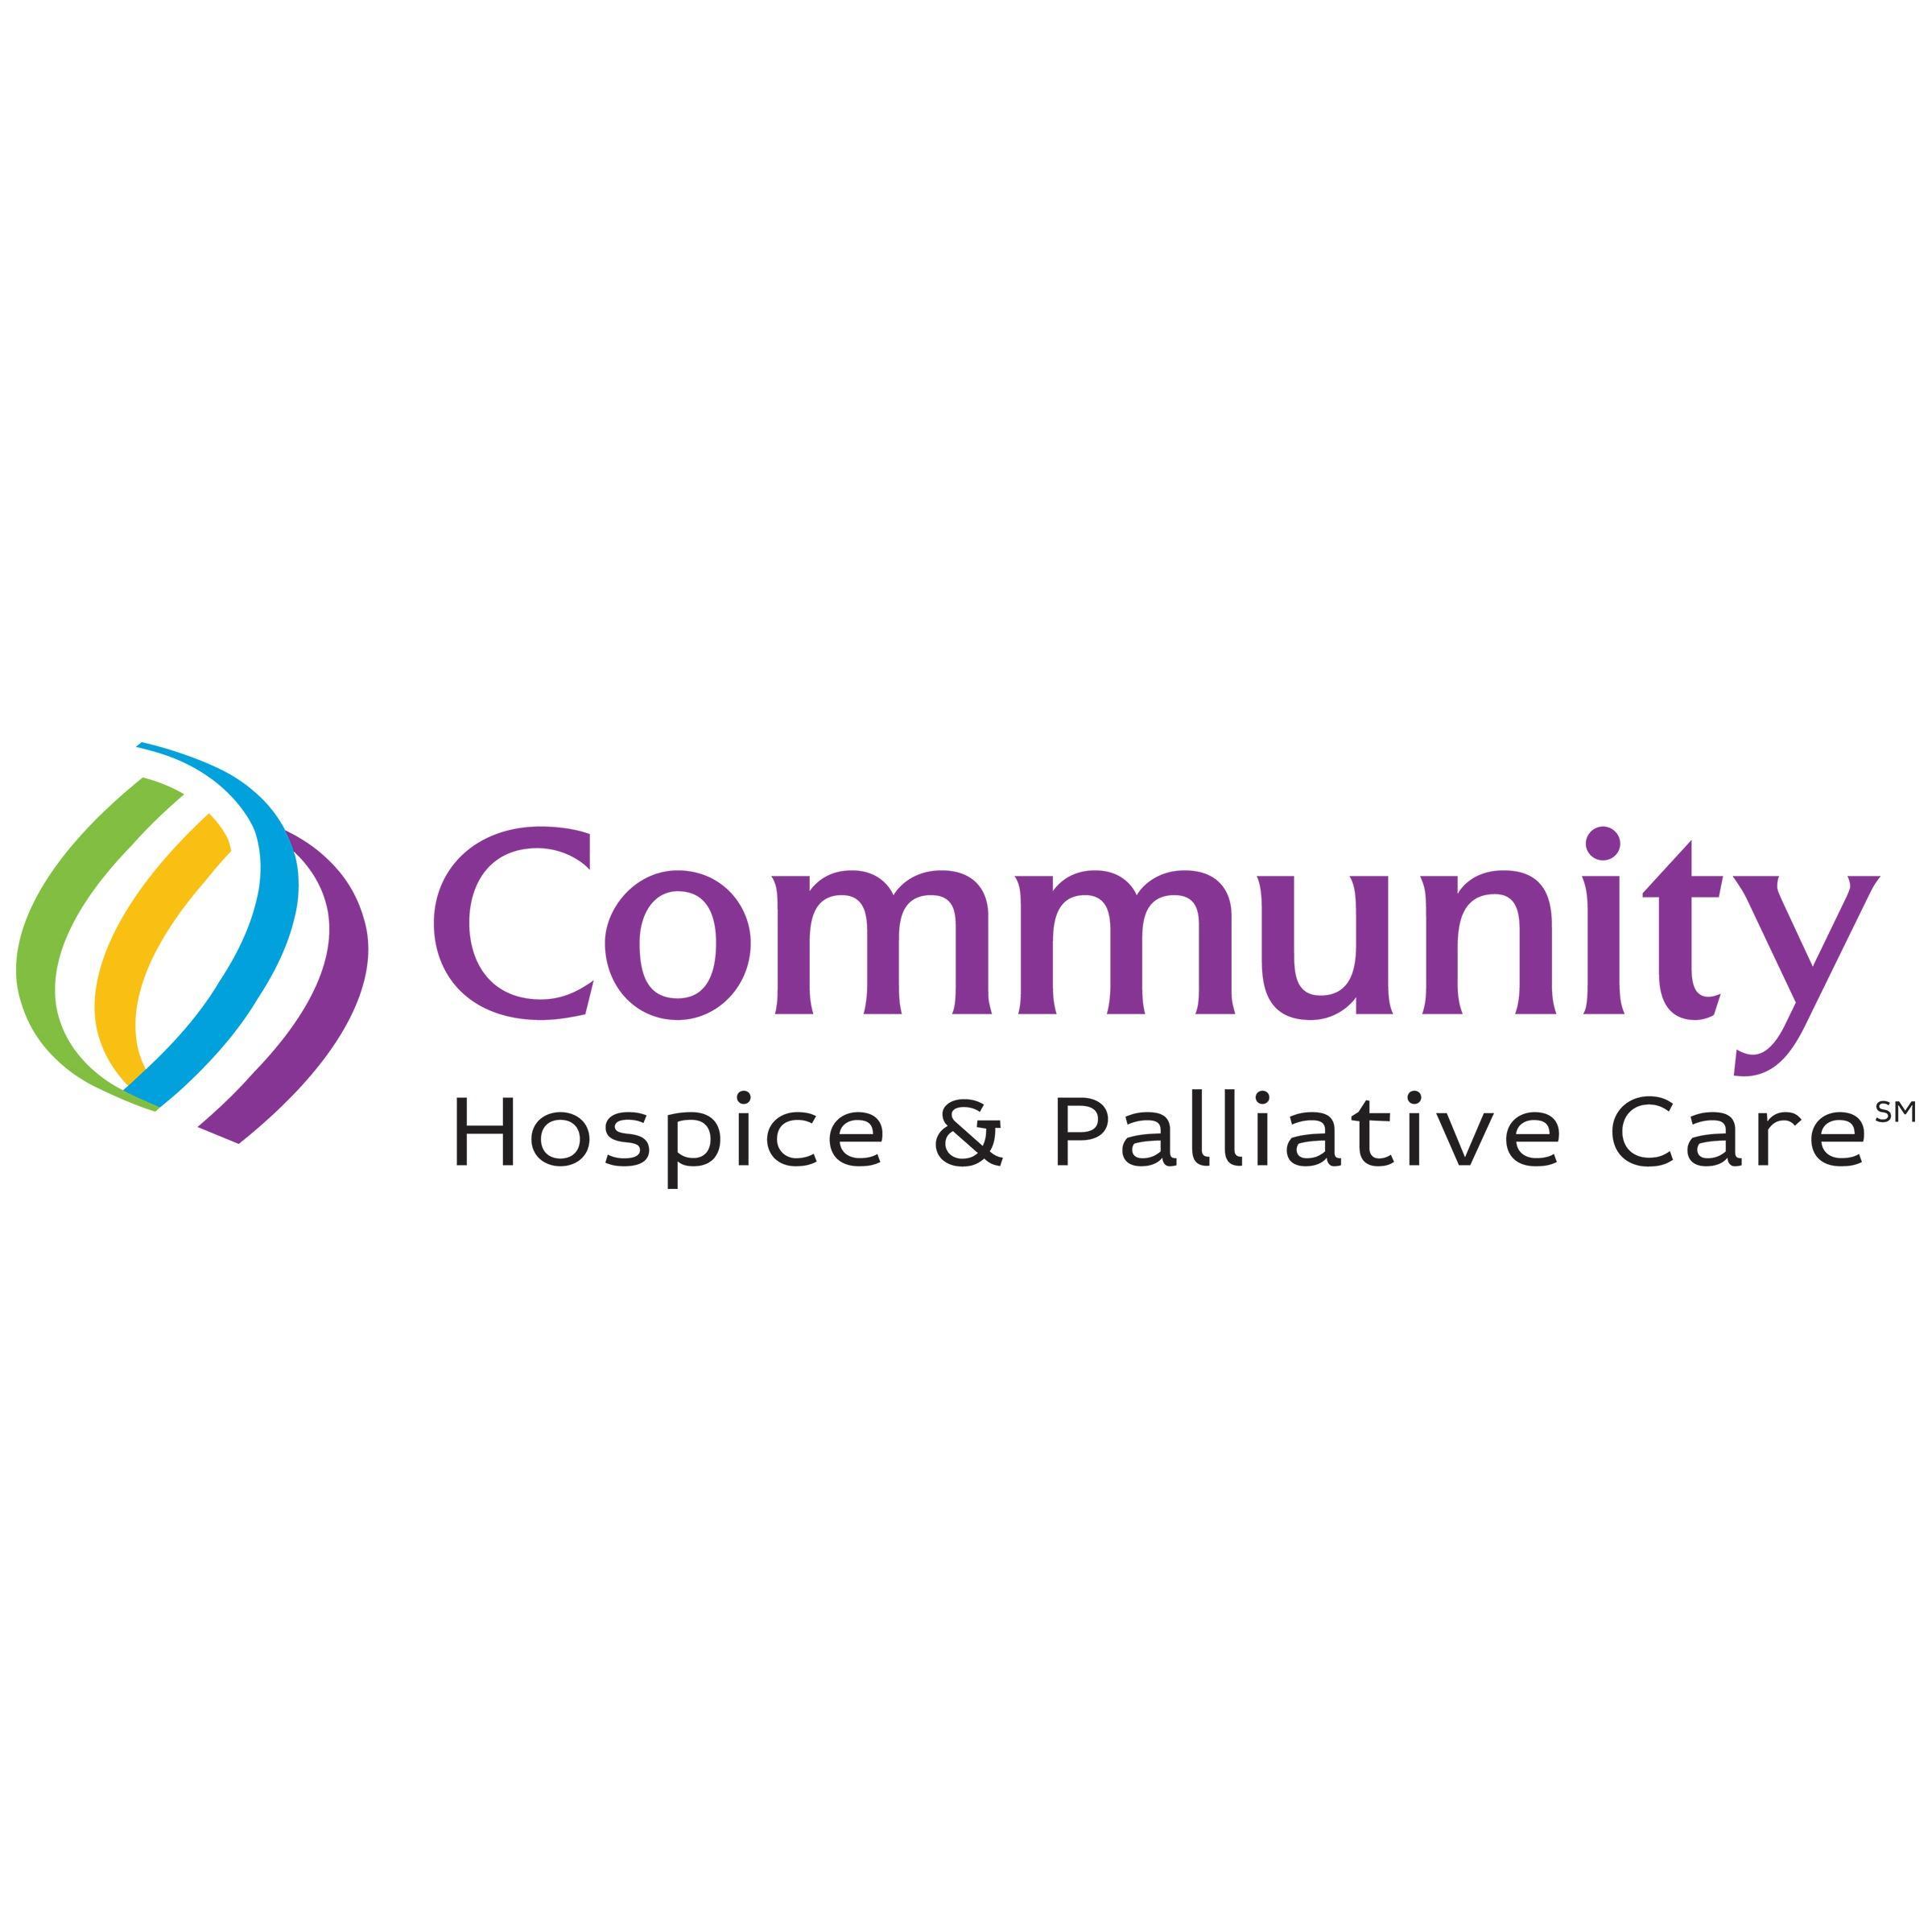 Community Hospice & Palliative Care